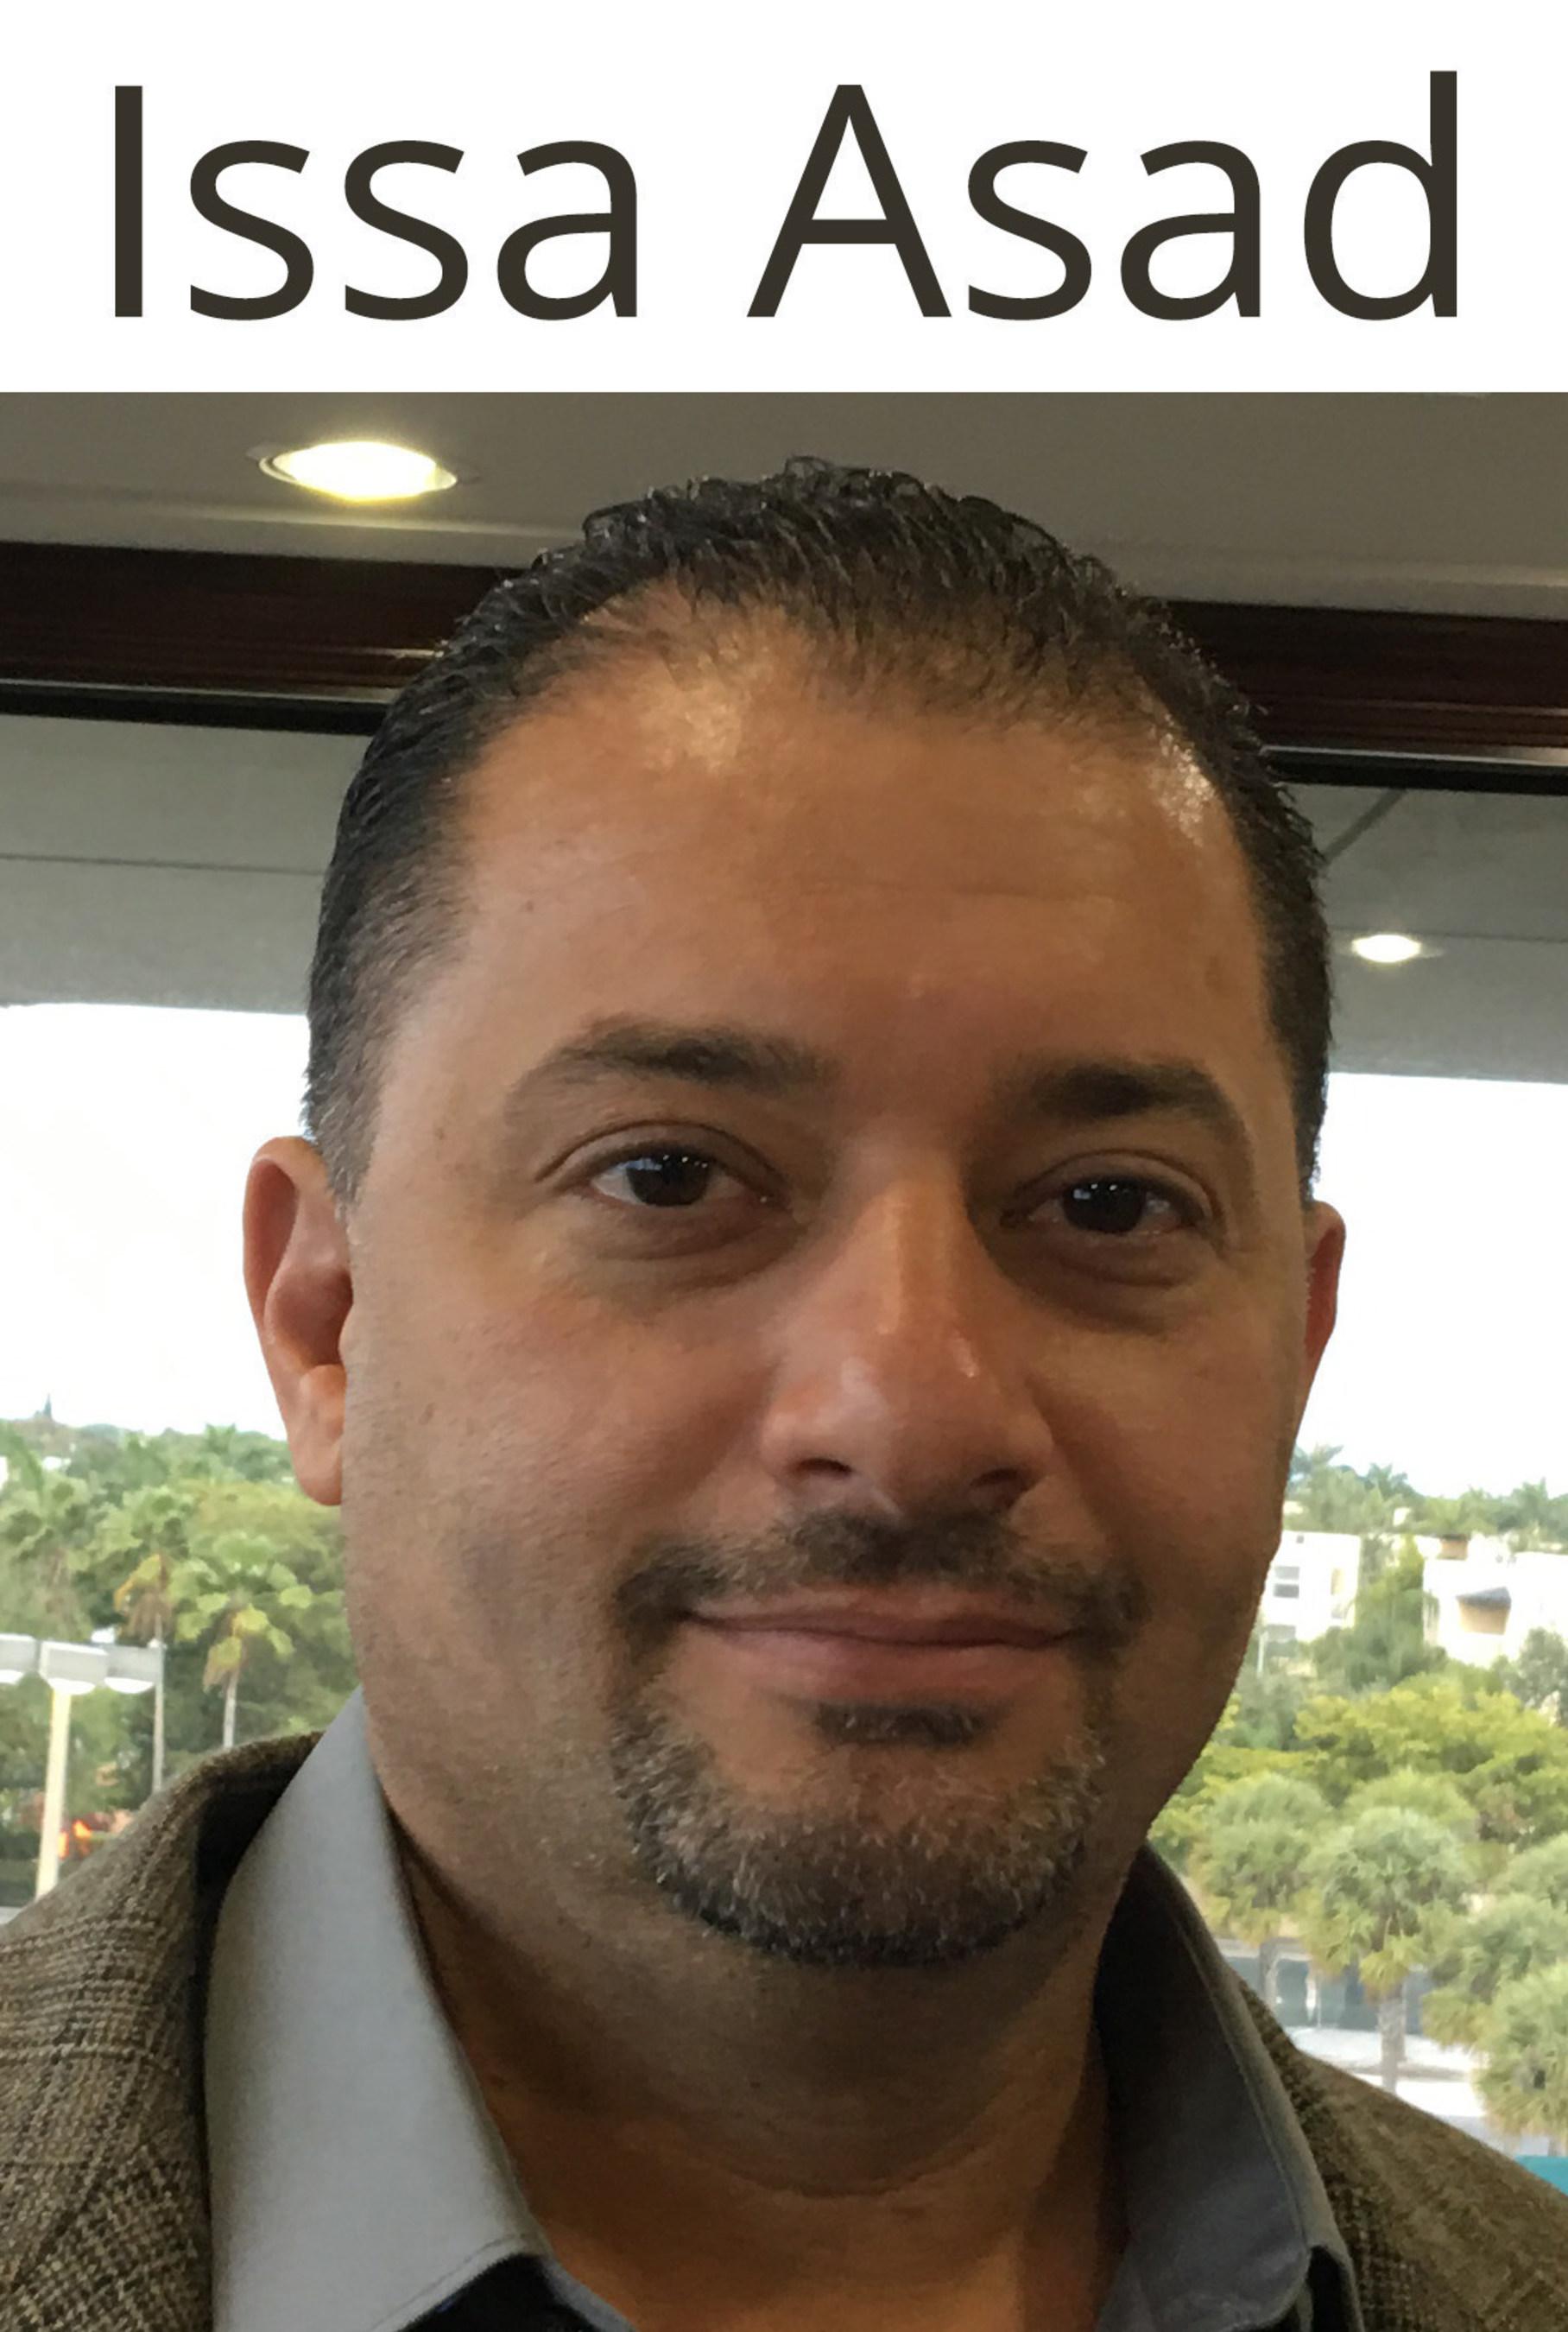 CEO Issa Asad